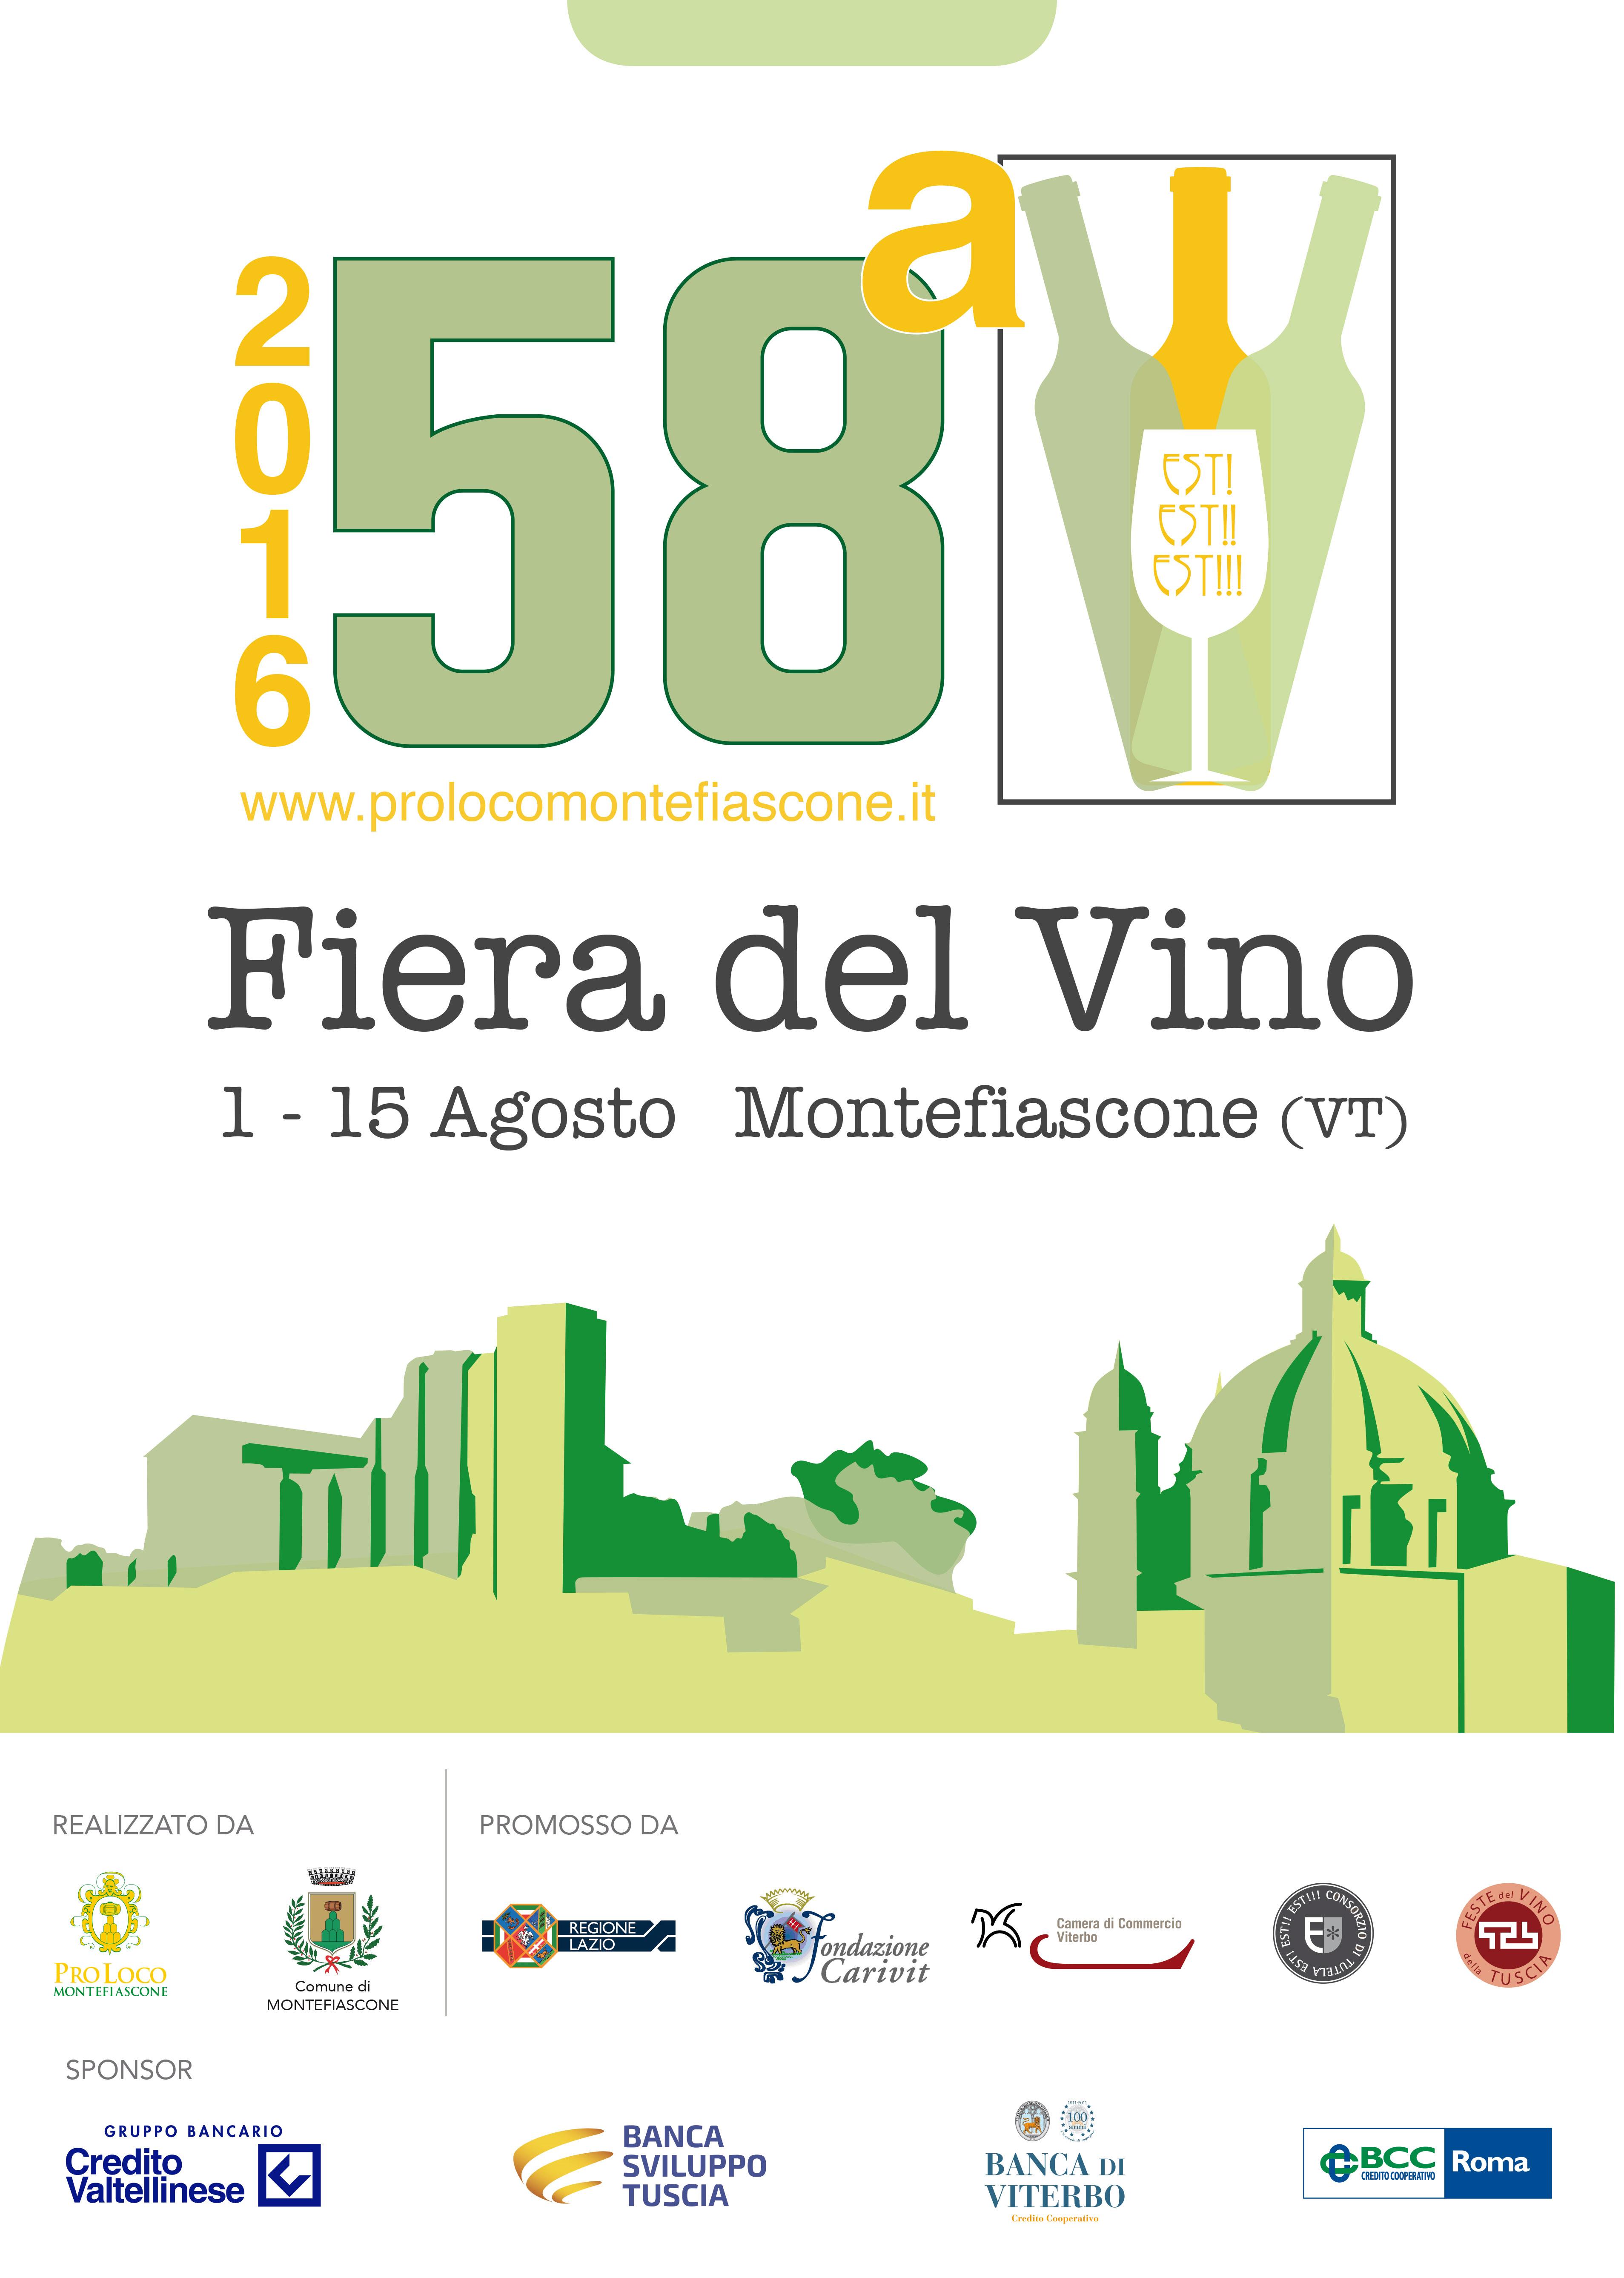 Fiera del vino montefiscone 2016